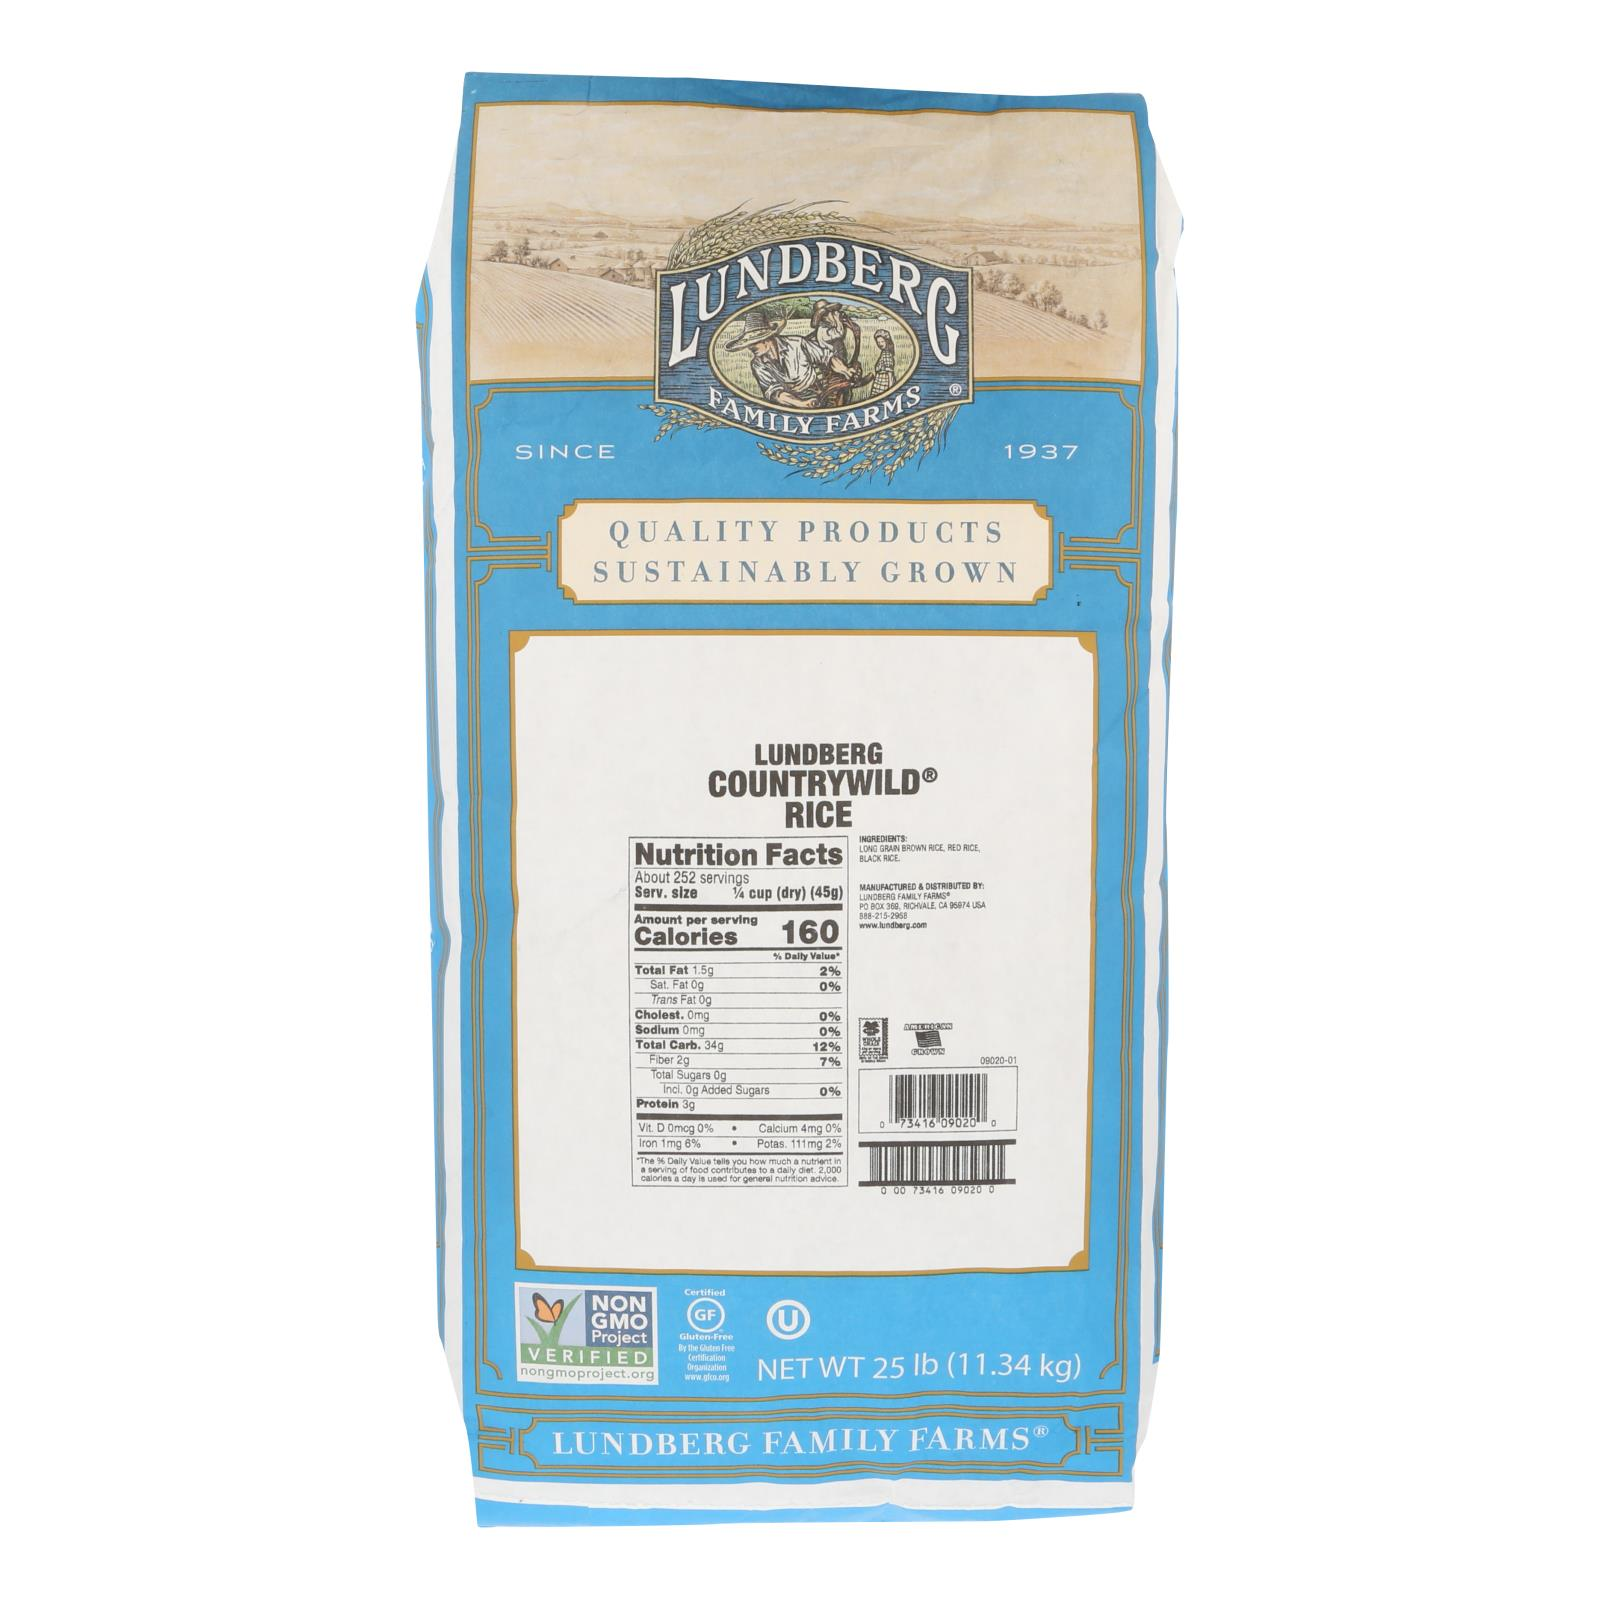 Lundberg Family Farms Whole Grain Brown Rice - Case of 25 lbs %count(alt)